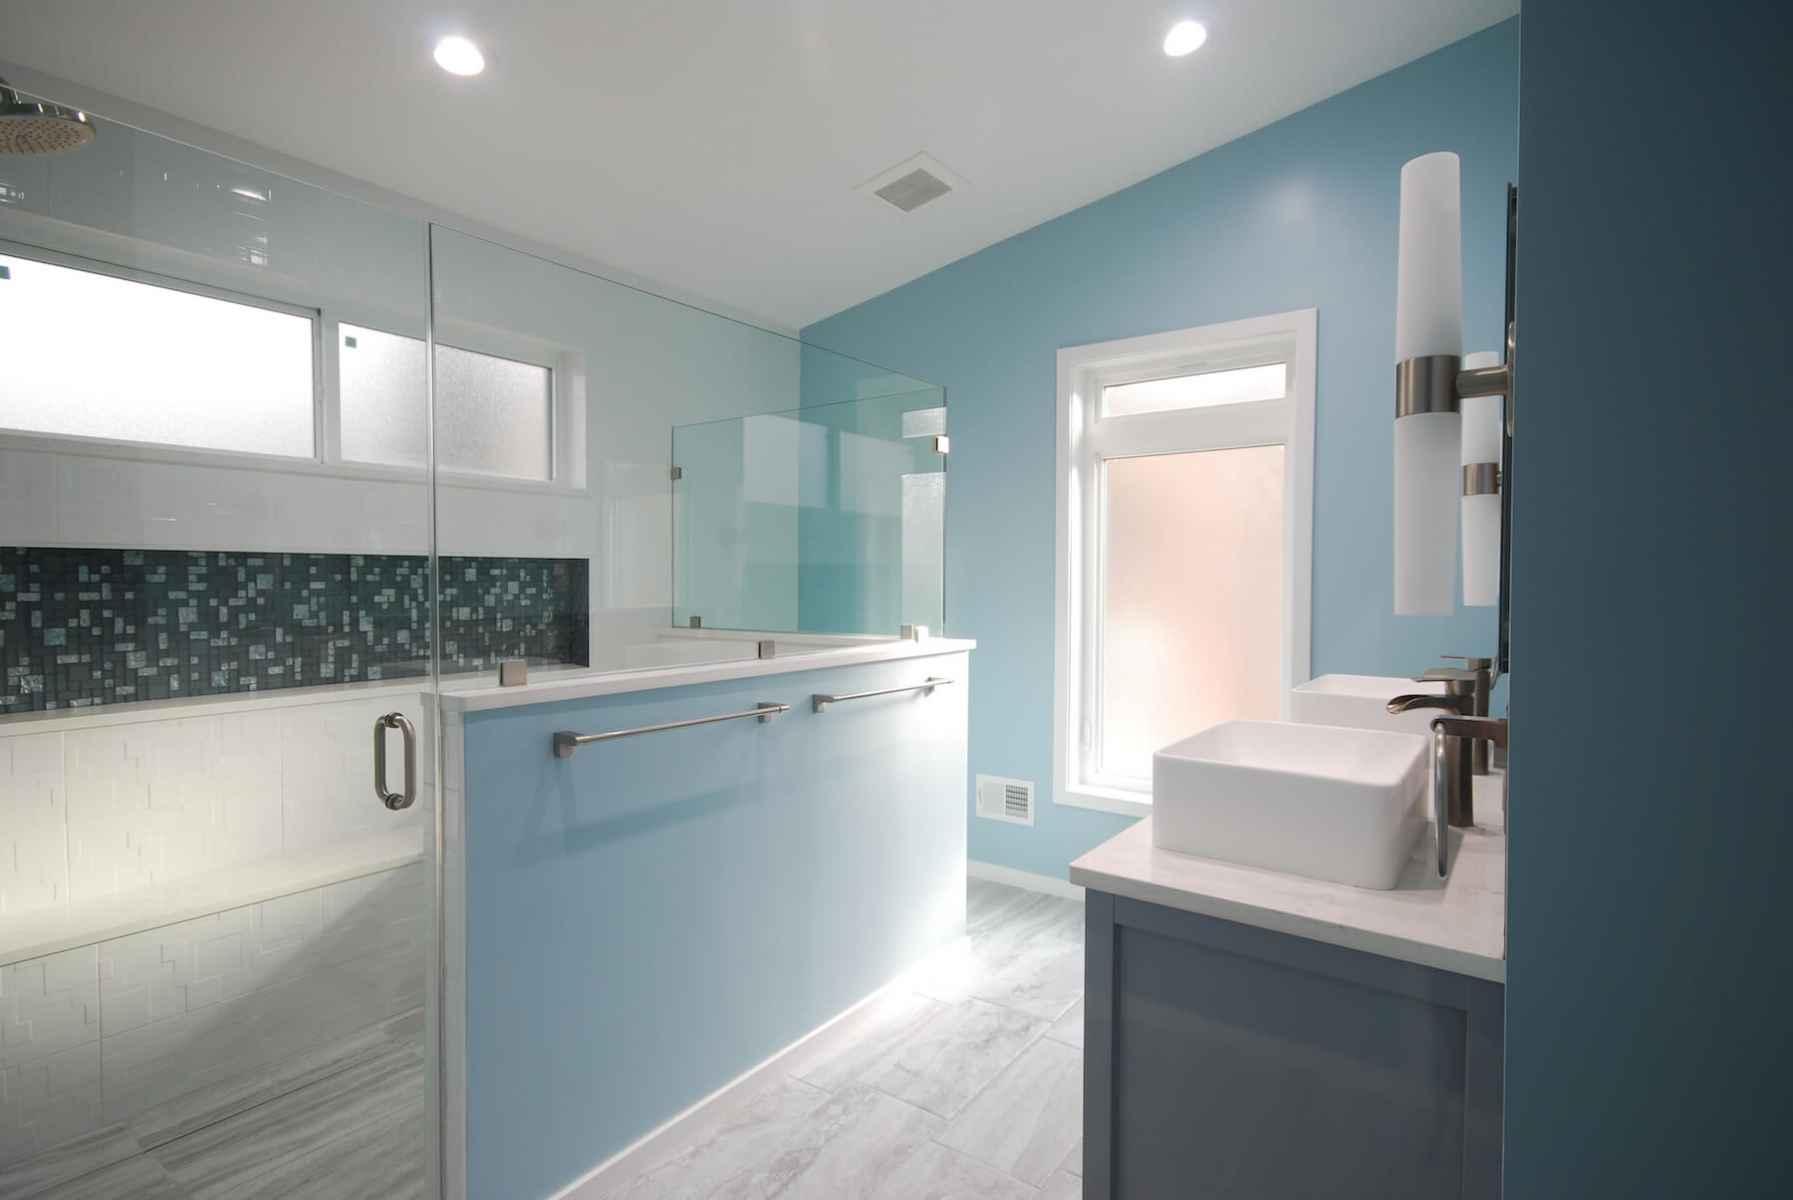 bathroomadd8441-1